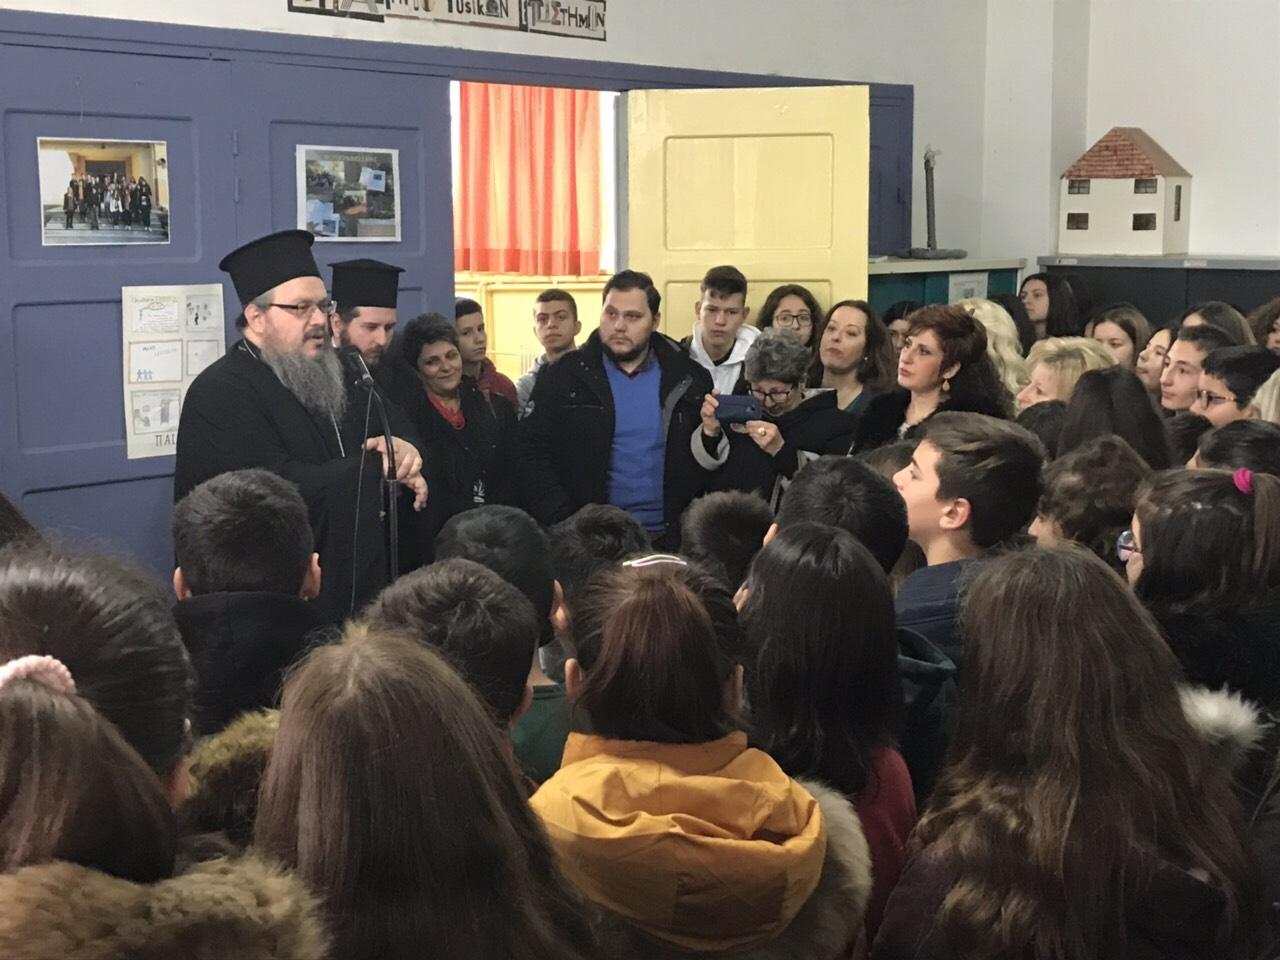 sxolia tirnavos 3 - Σε σχολεία του Τυρνάβου ο Σεβασμιώτατος (φωτ.)